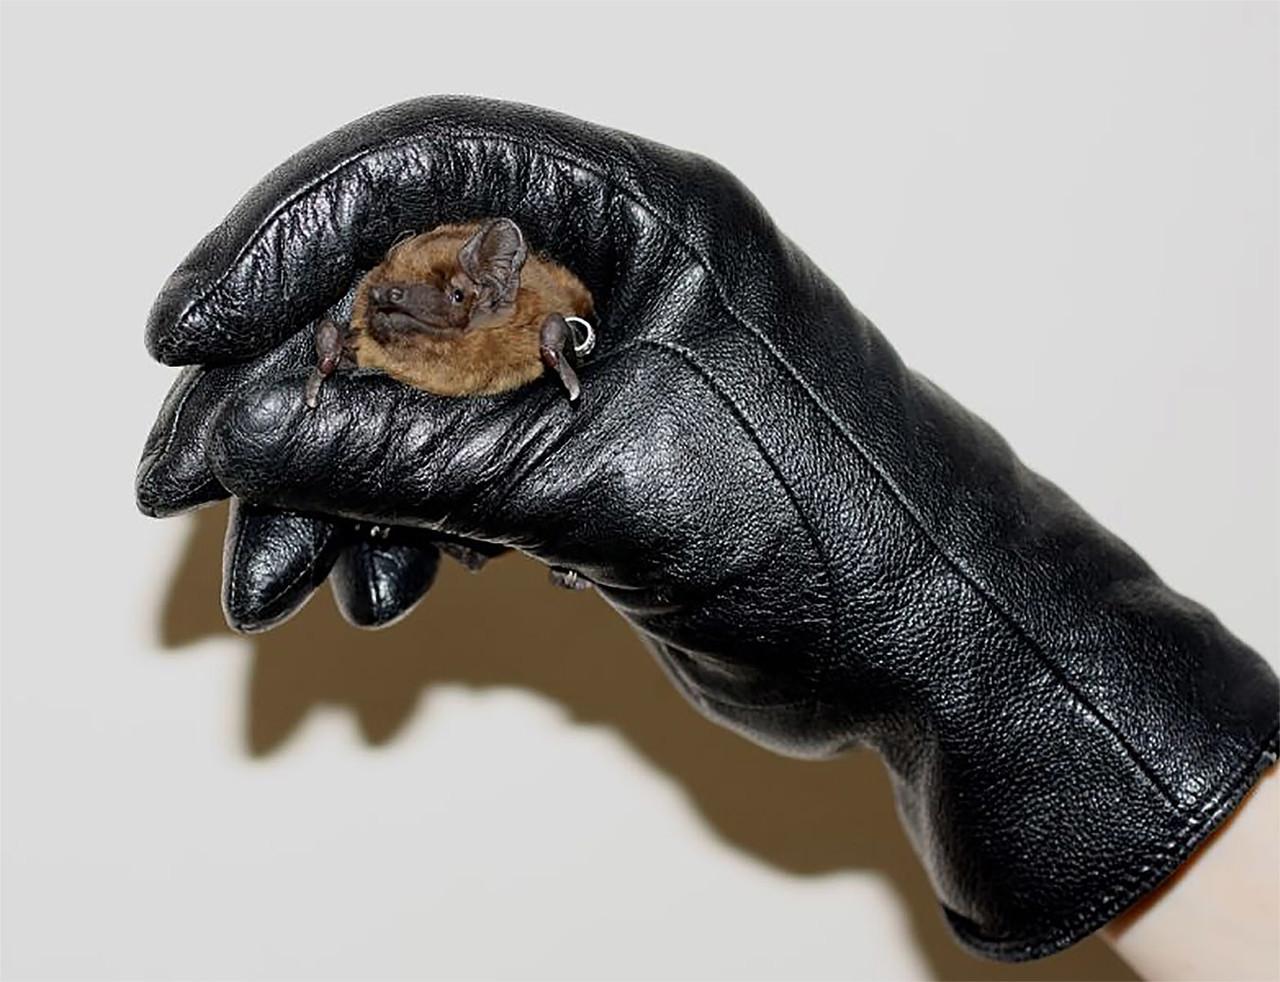 Монтажники окон могут помочь летучим мышам